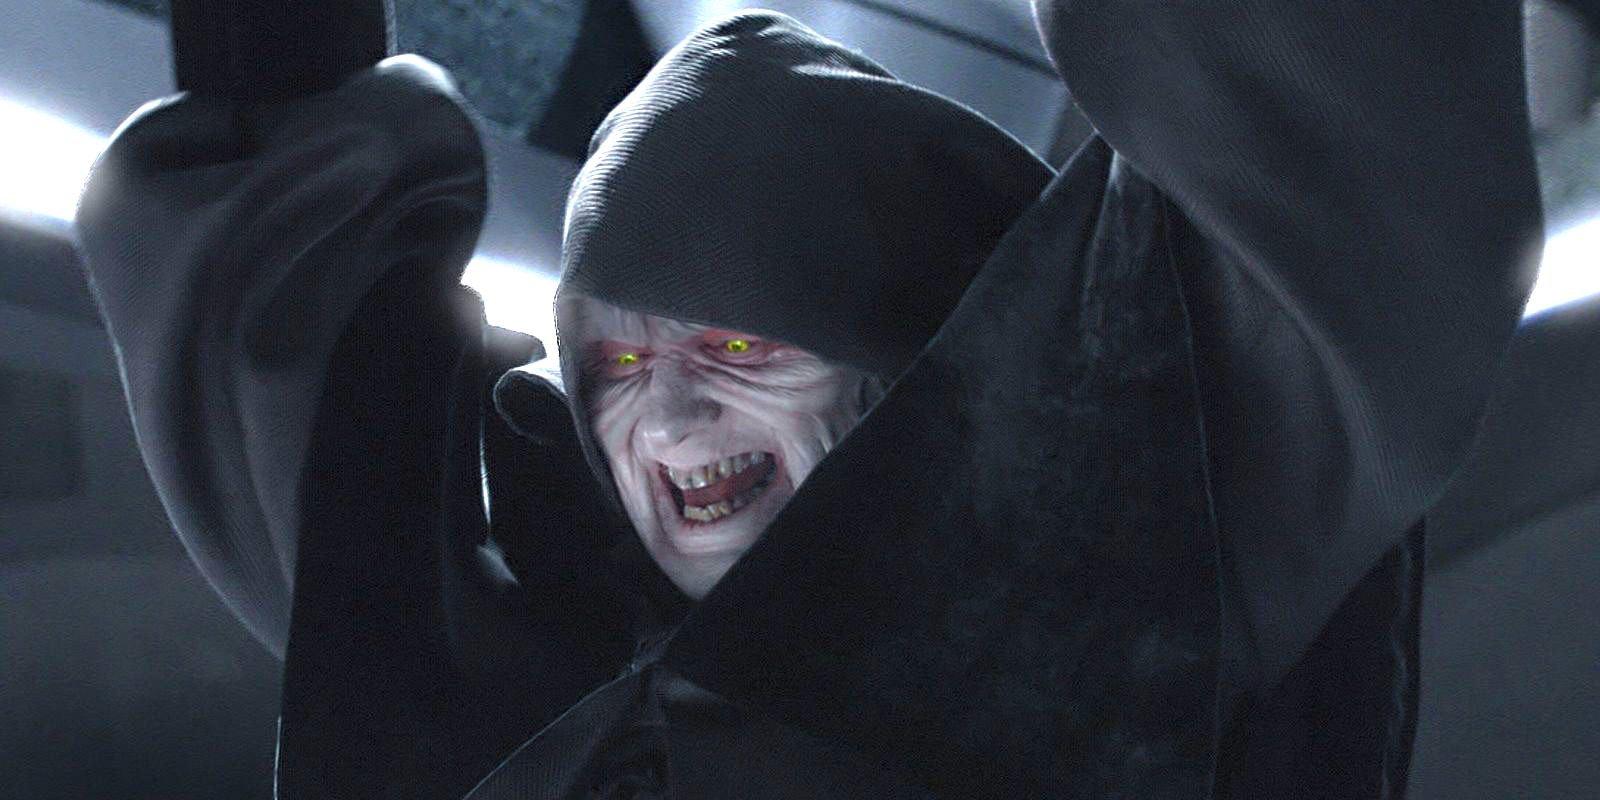 Star Wars Prequels Theory Reveals A Shocking Villain Worse Than Palpatine